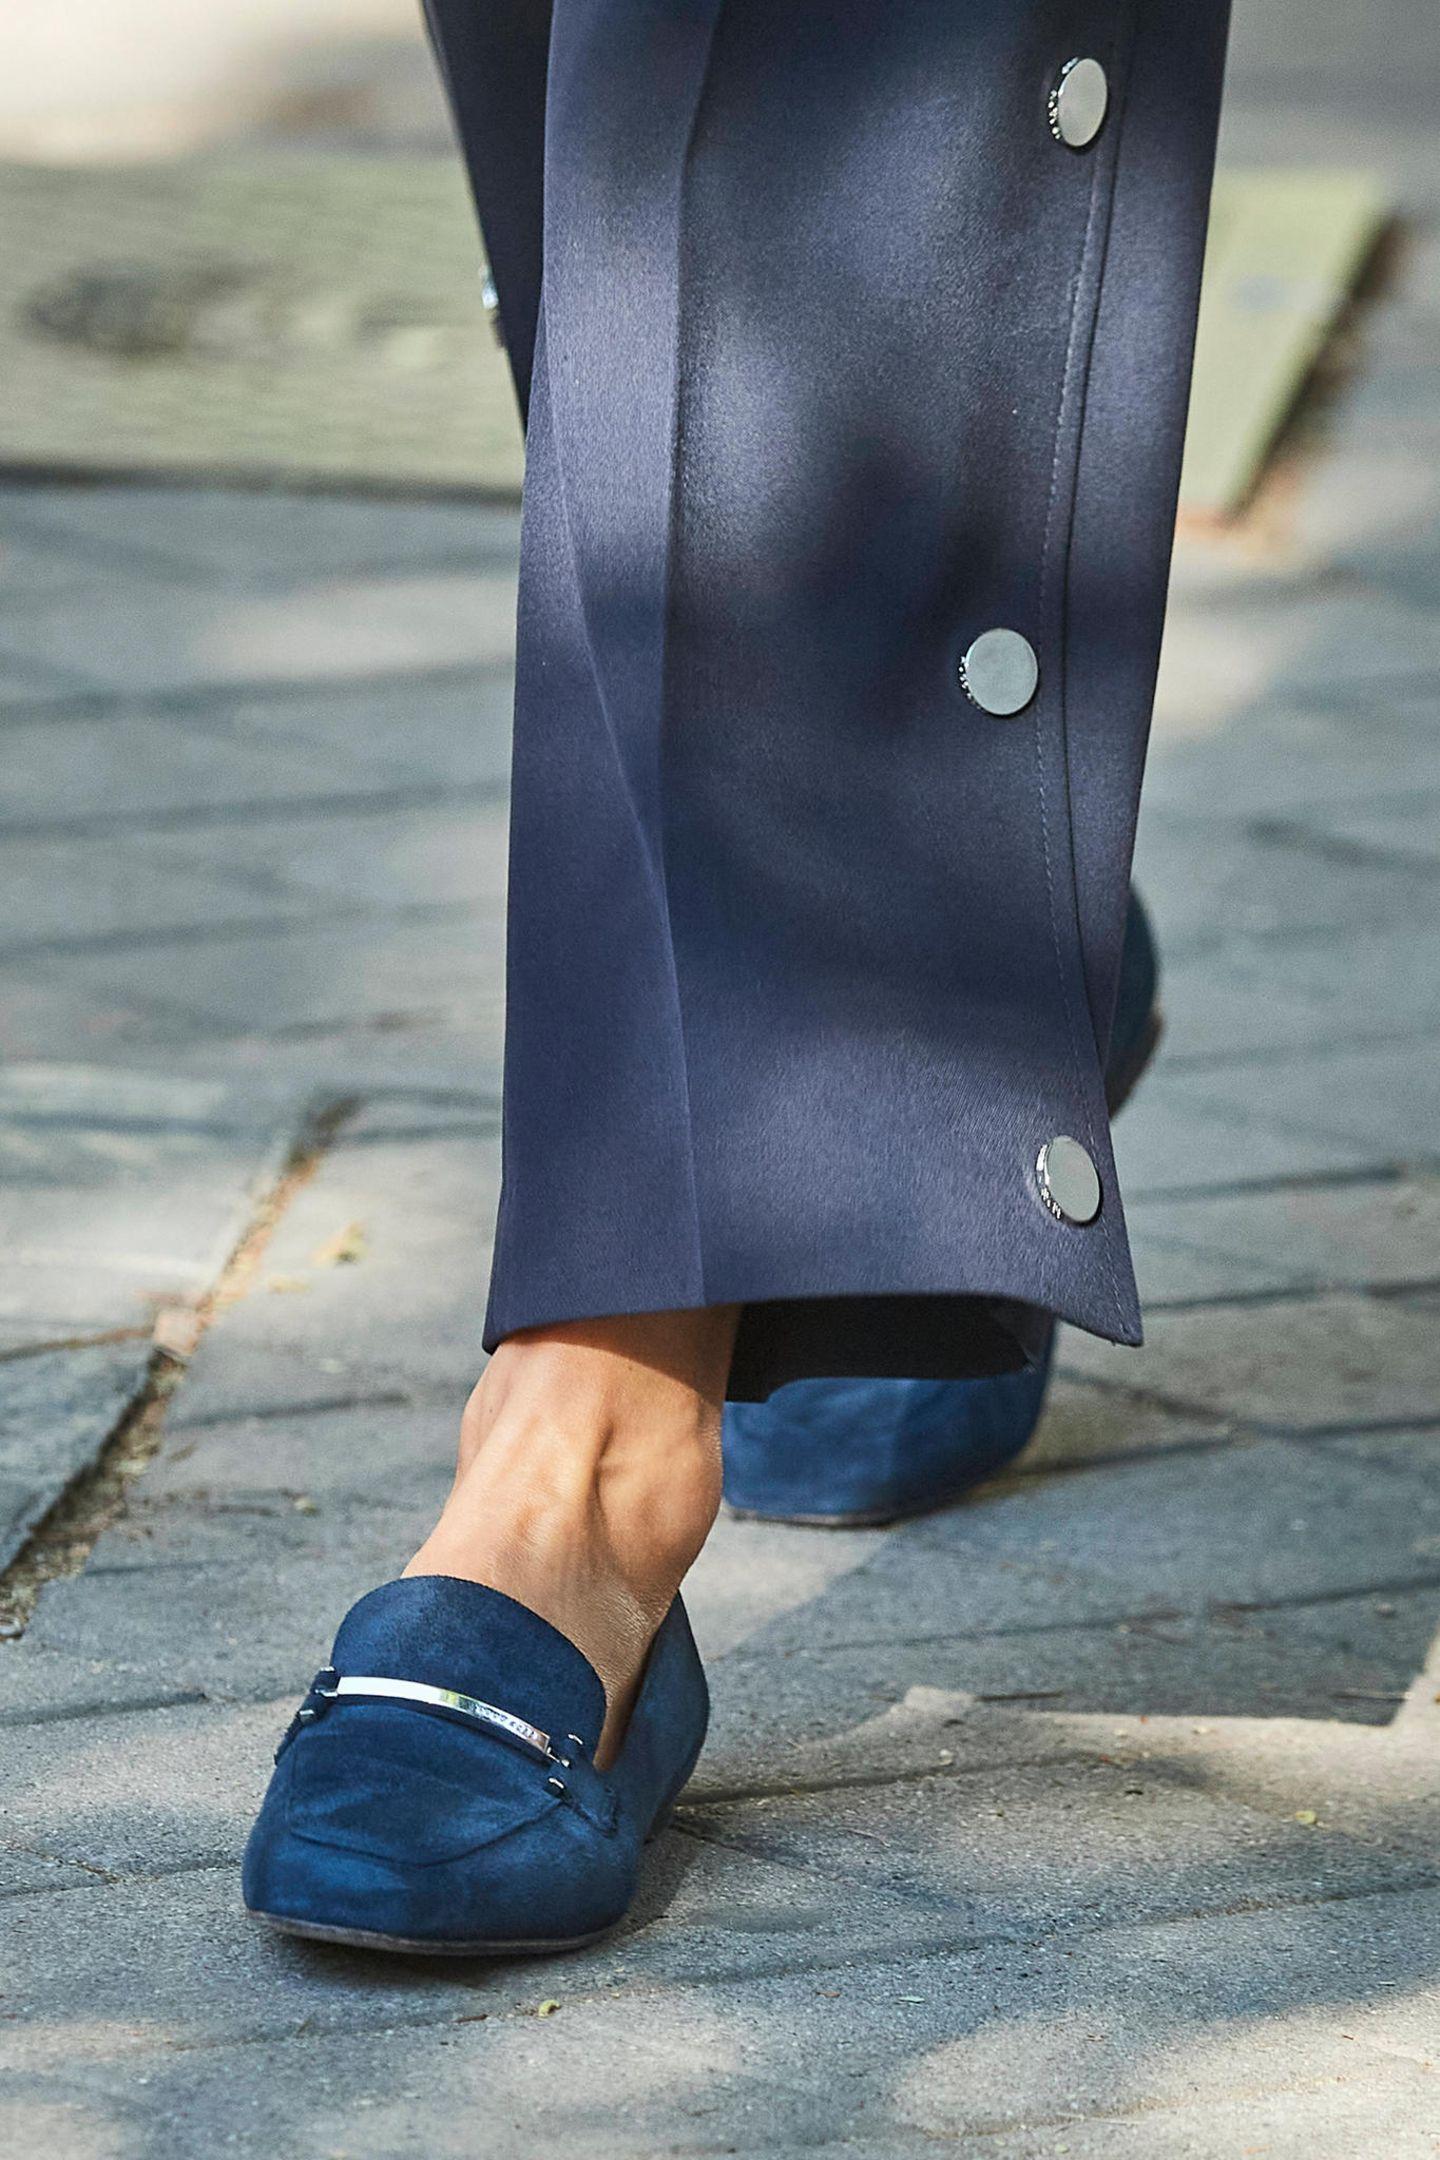 Königin Letizia trägt Loafer von Hugo Boss